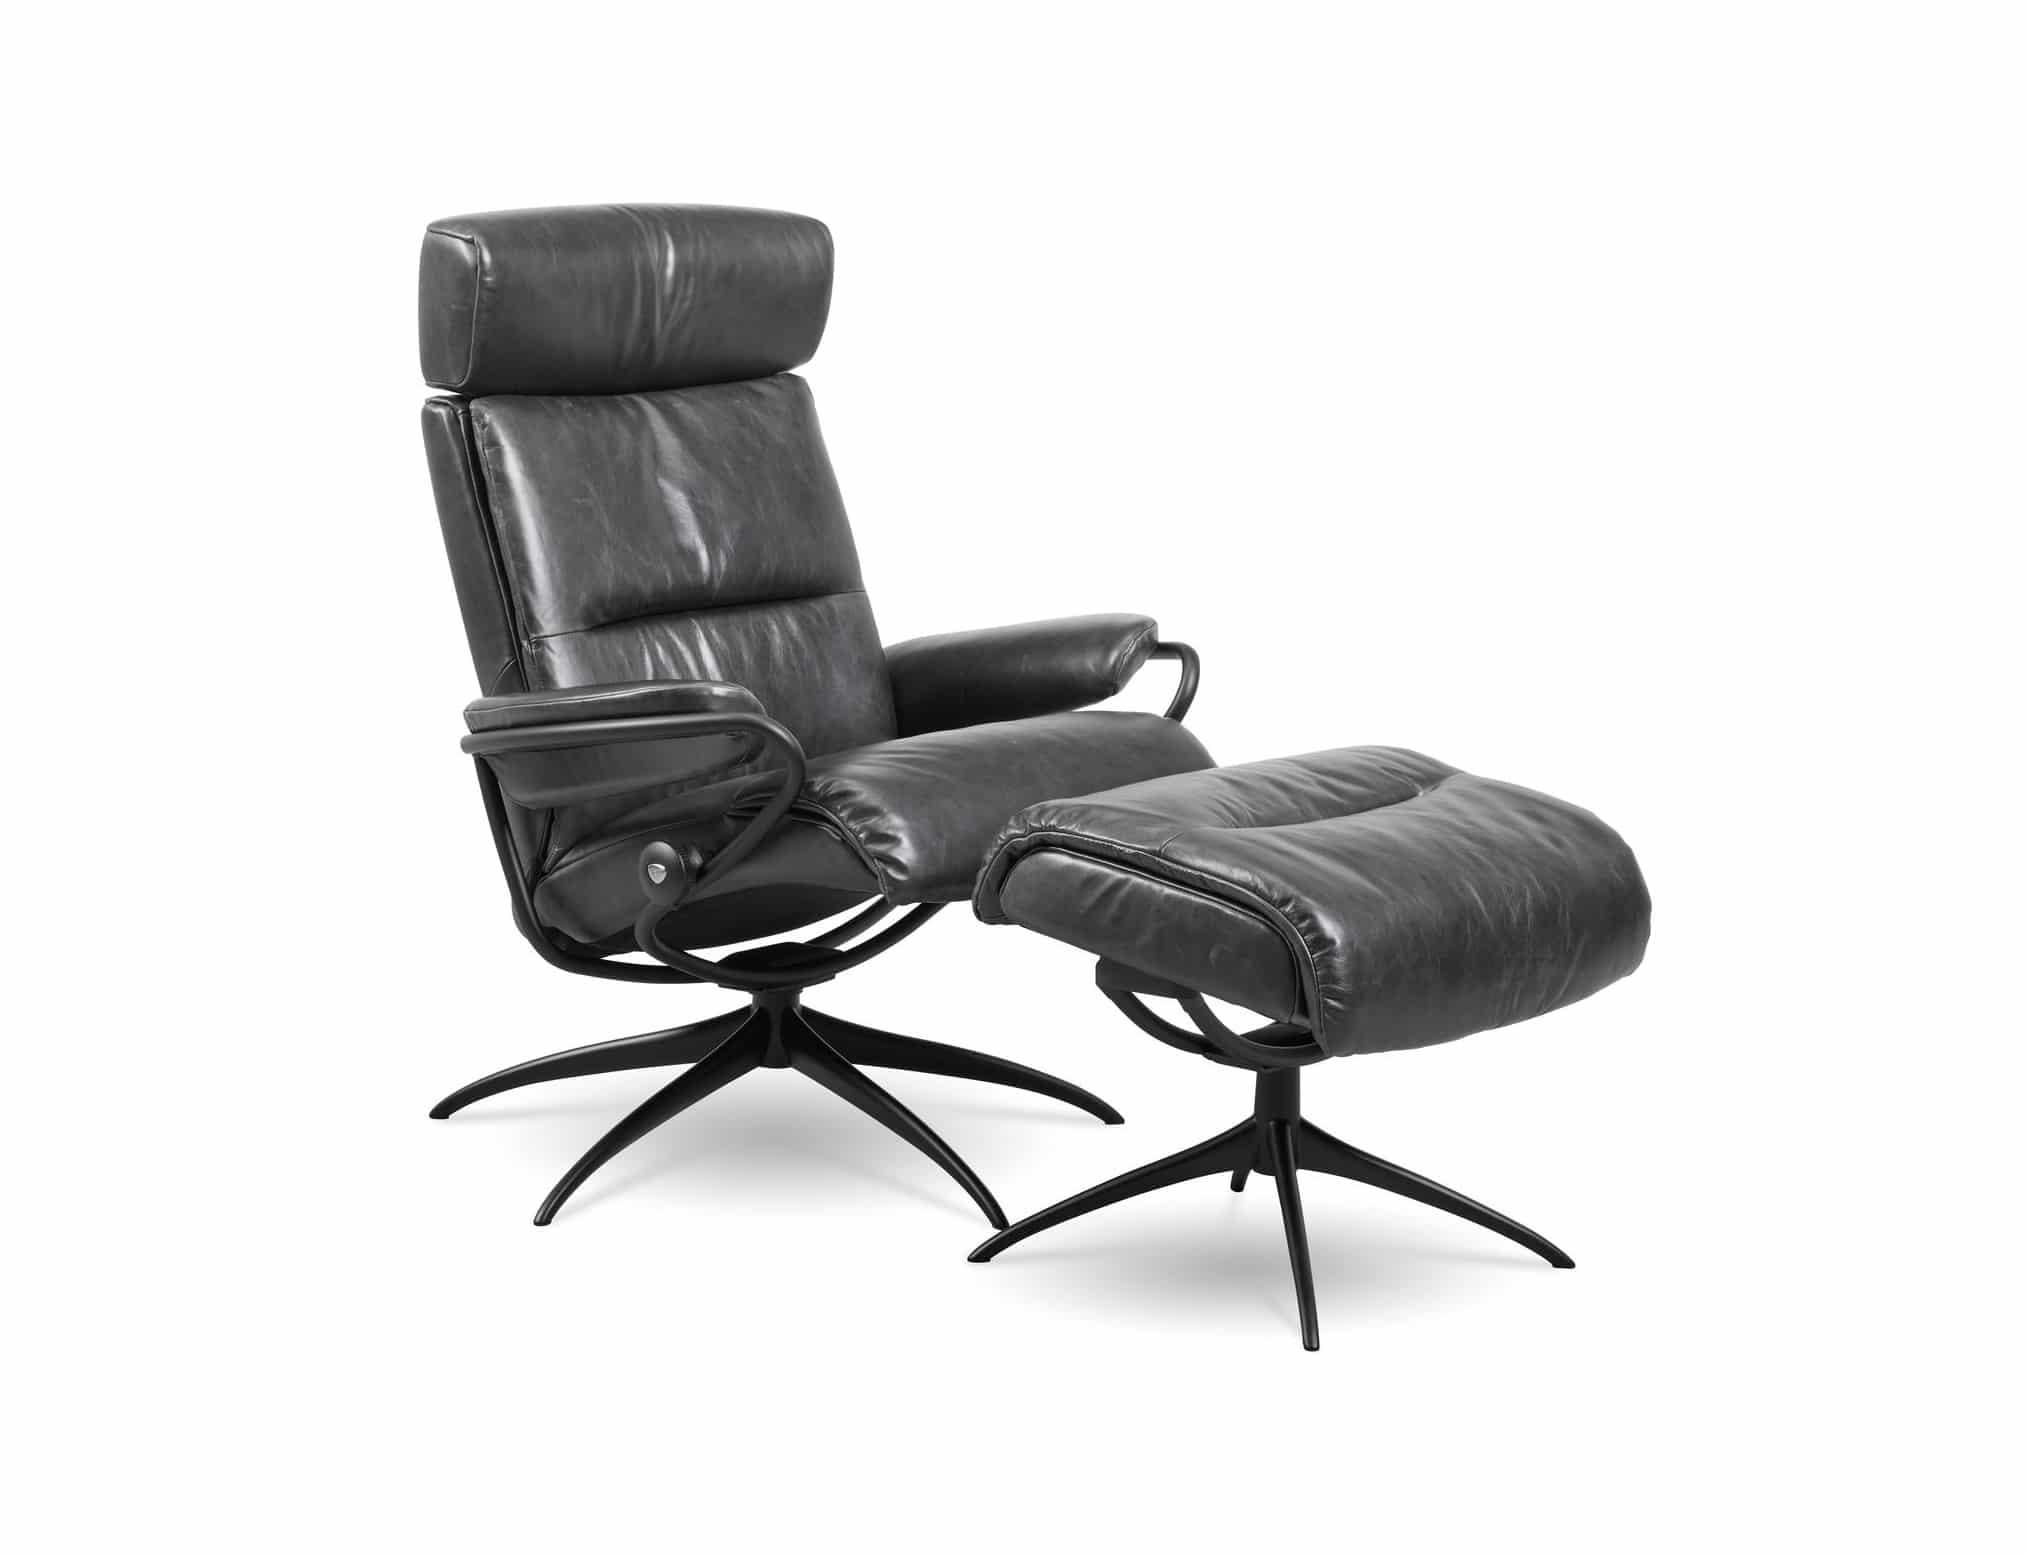 stressless tokyo recliner star base pioneer black leather